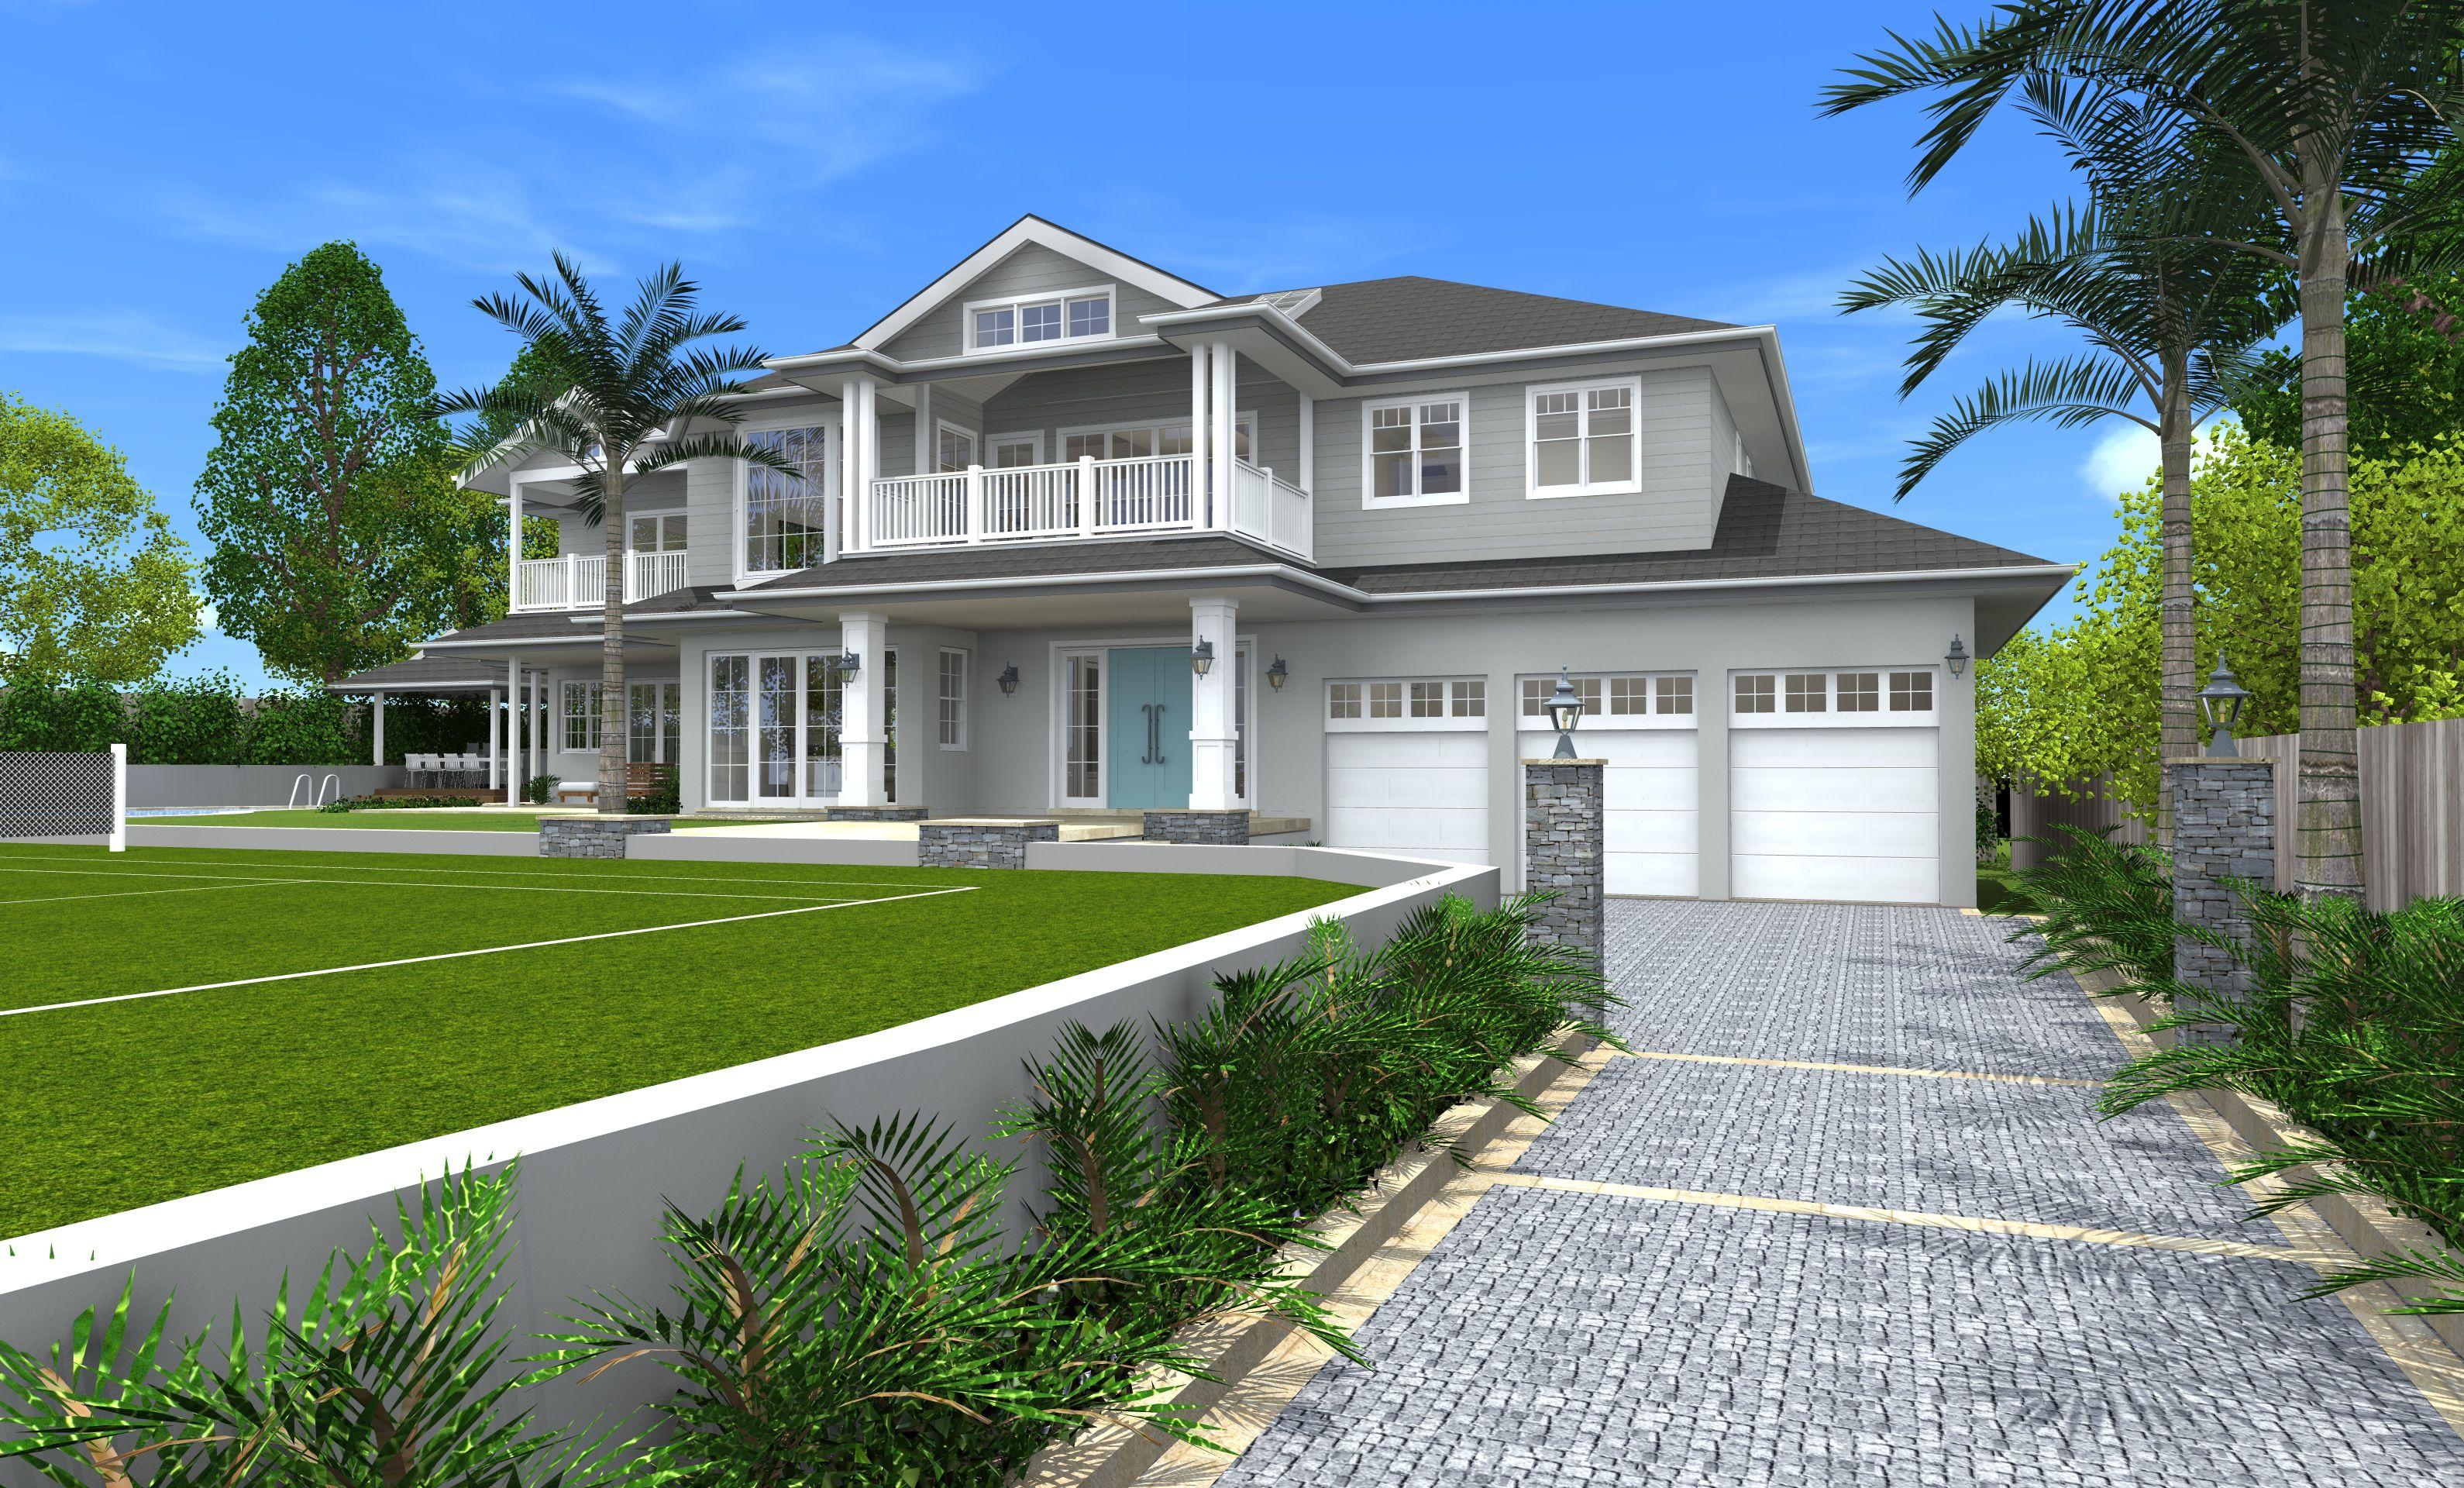 Architect Design 3d Concept Hamptons Style St Ives Sydney Hamptons Style Homes Hamptons House Hamptons Style